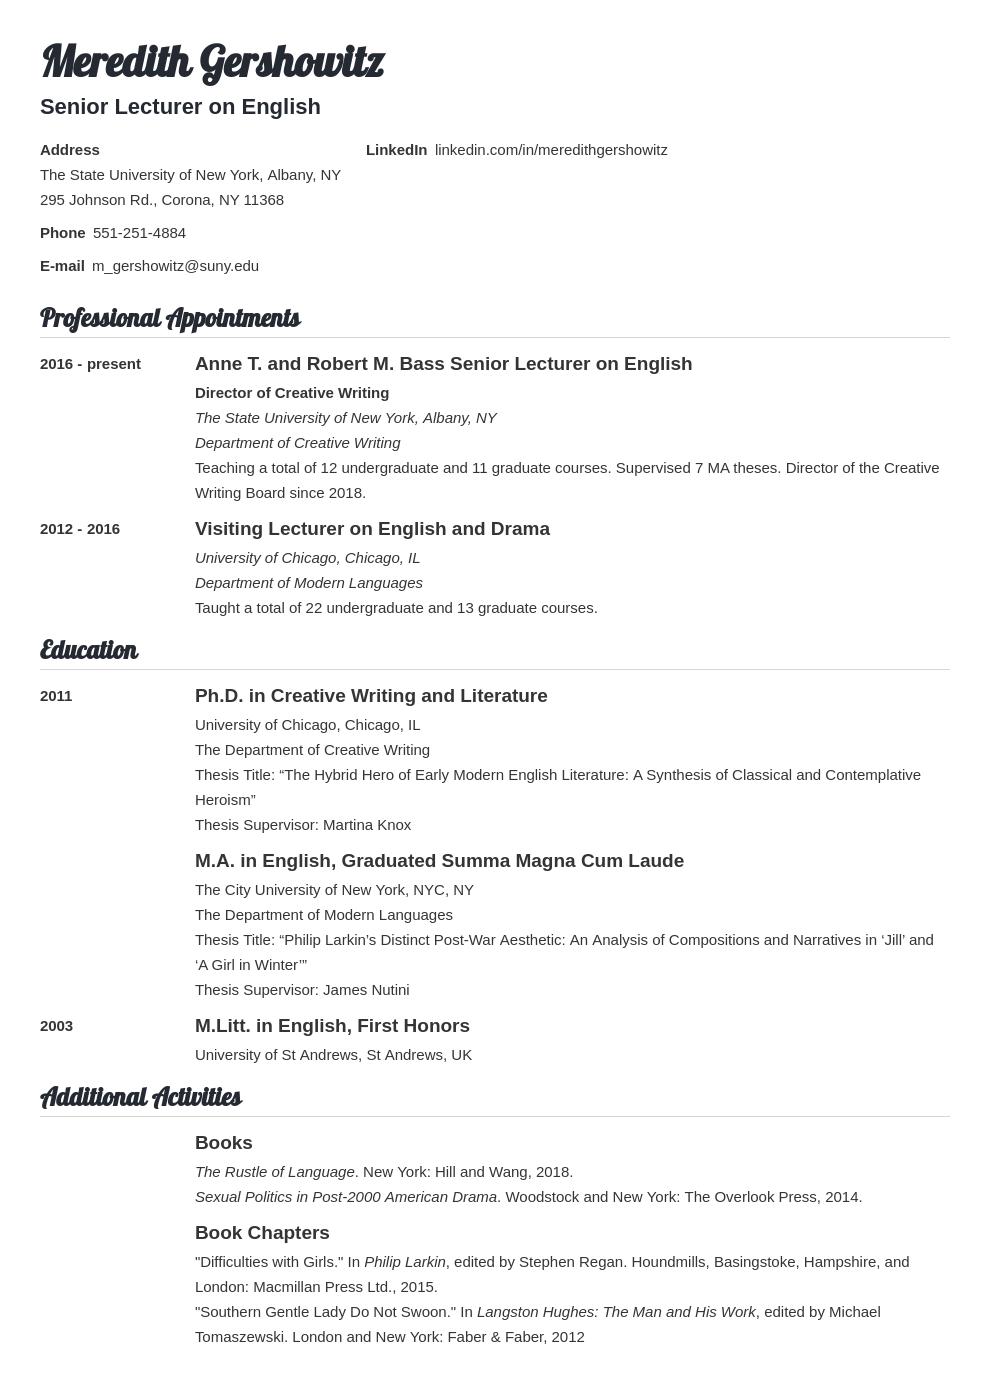 cv academic template valera uk